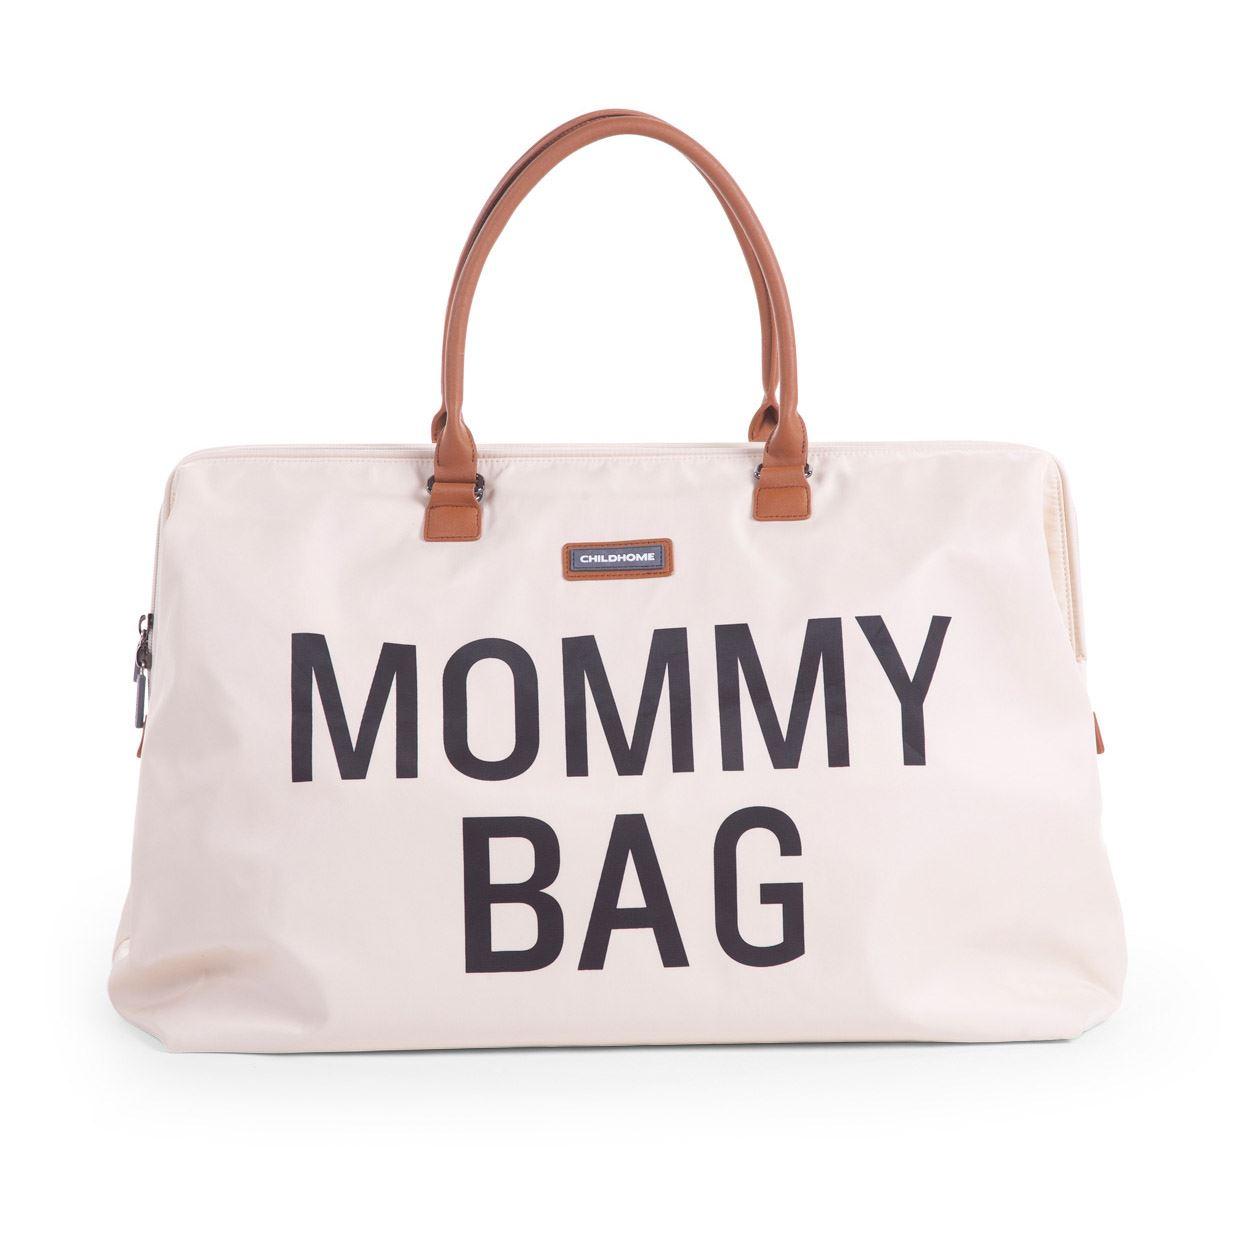 Mommy Bag - Piel - Camel